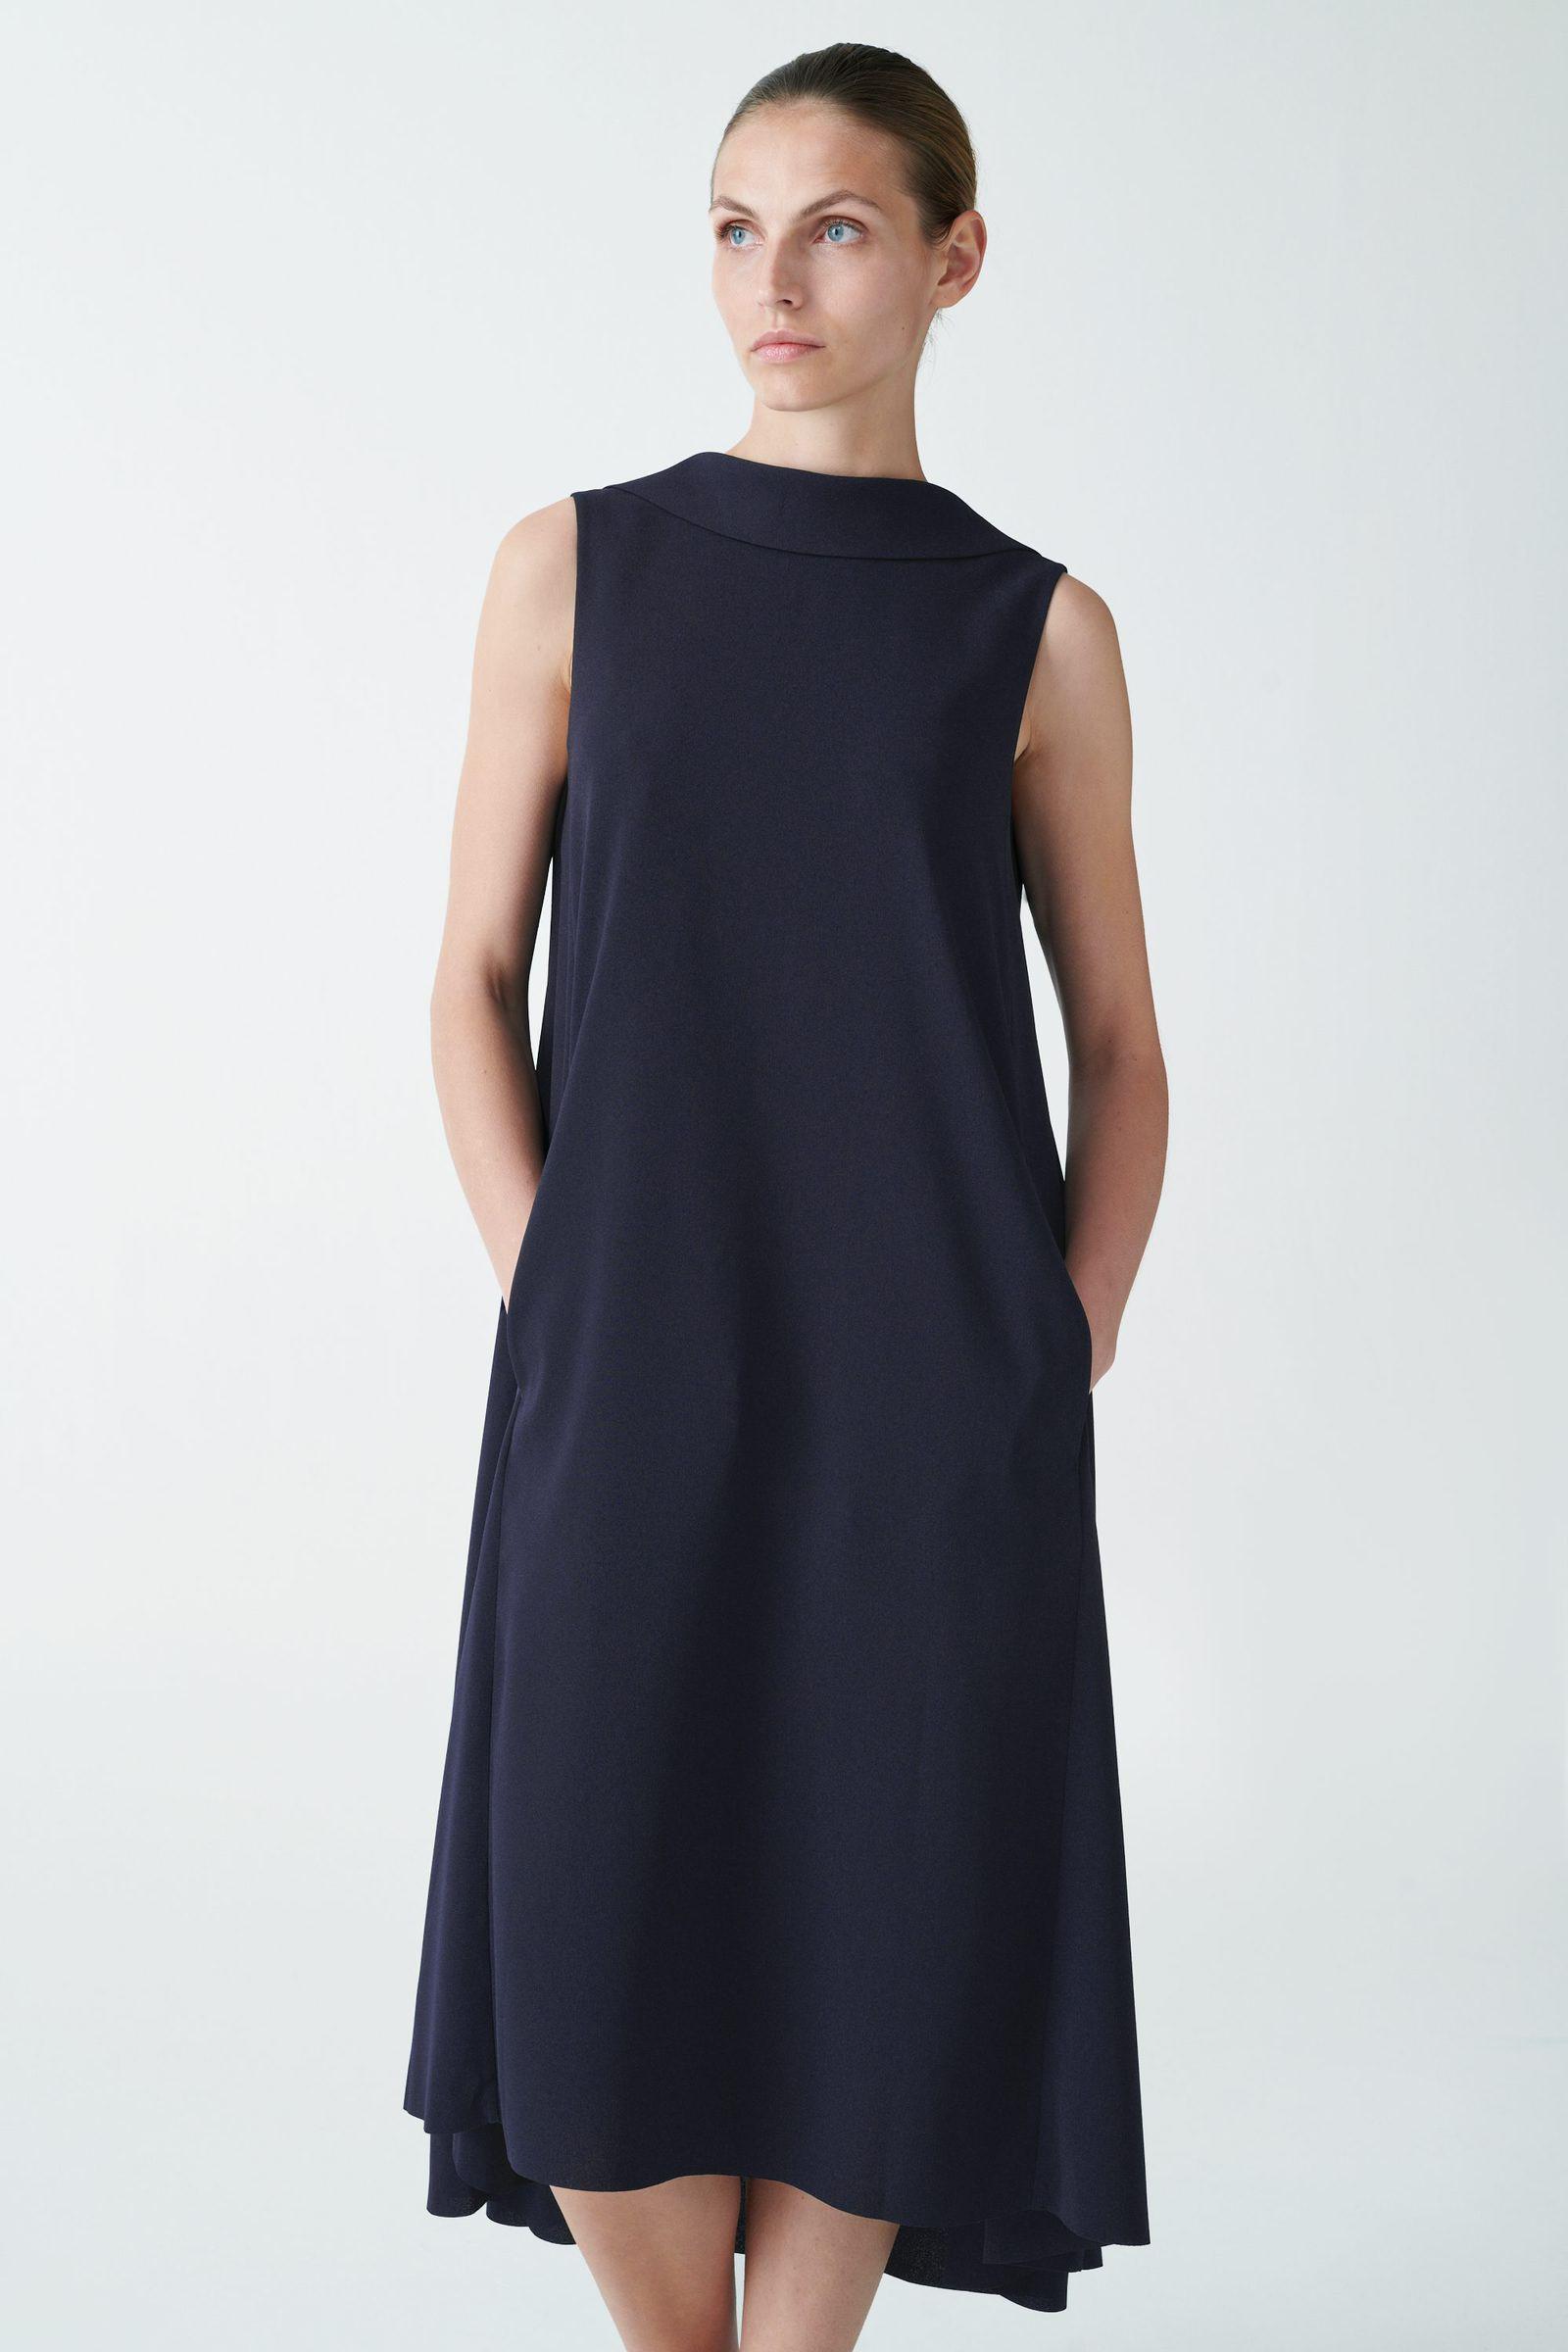 COS 하이 칼라 미디 드레스의 네이비컬러 ECOMLook입니다.